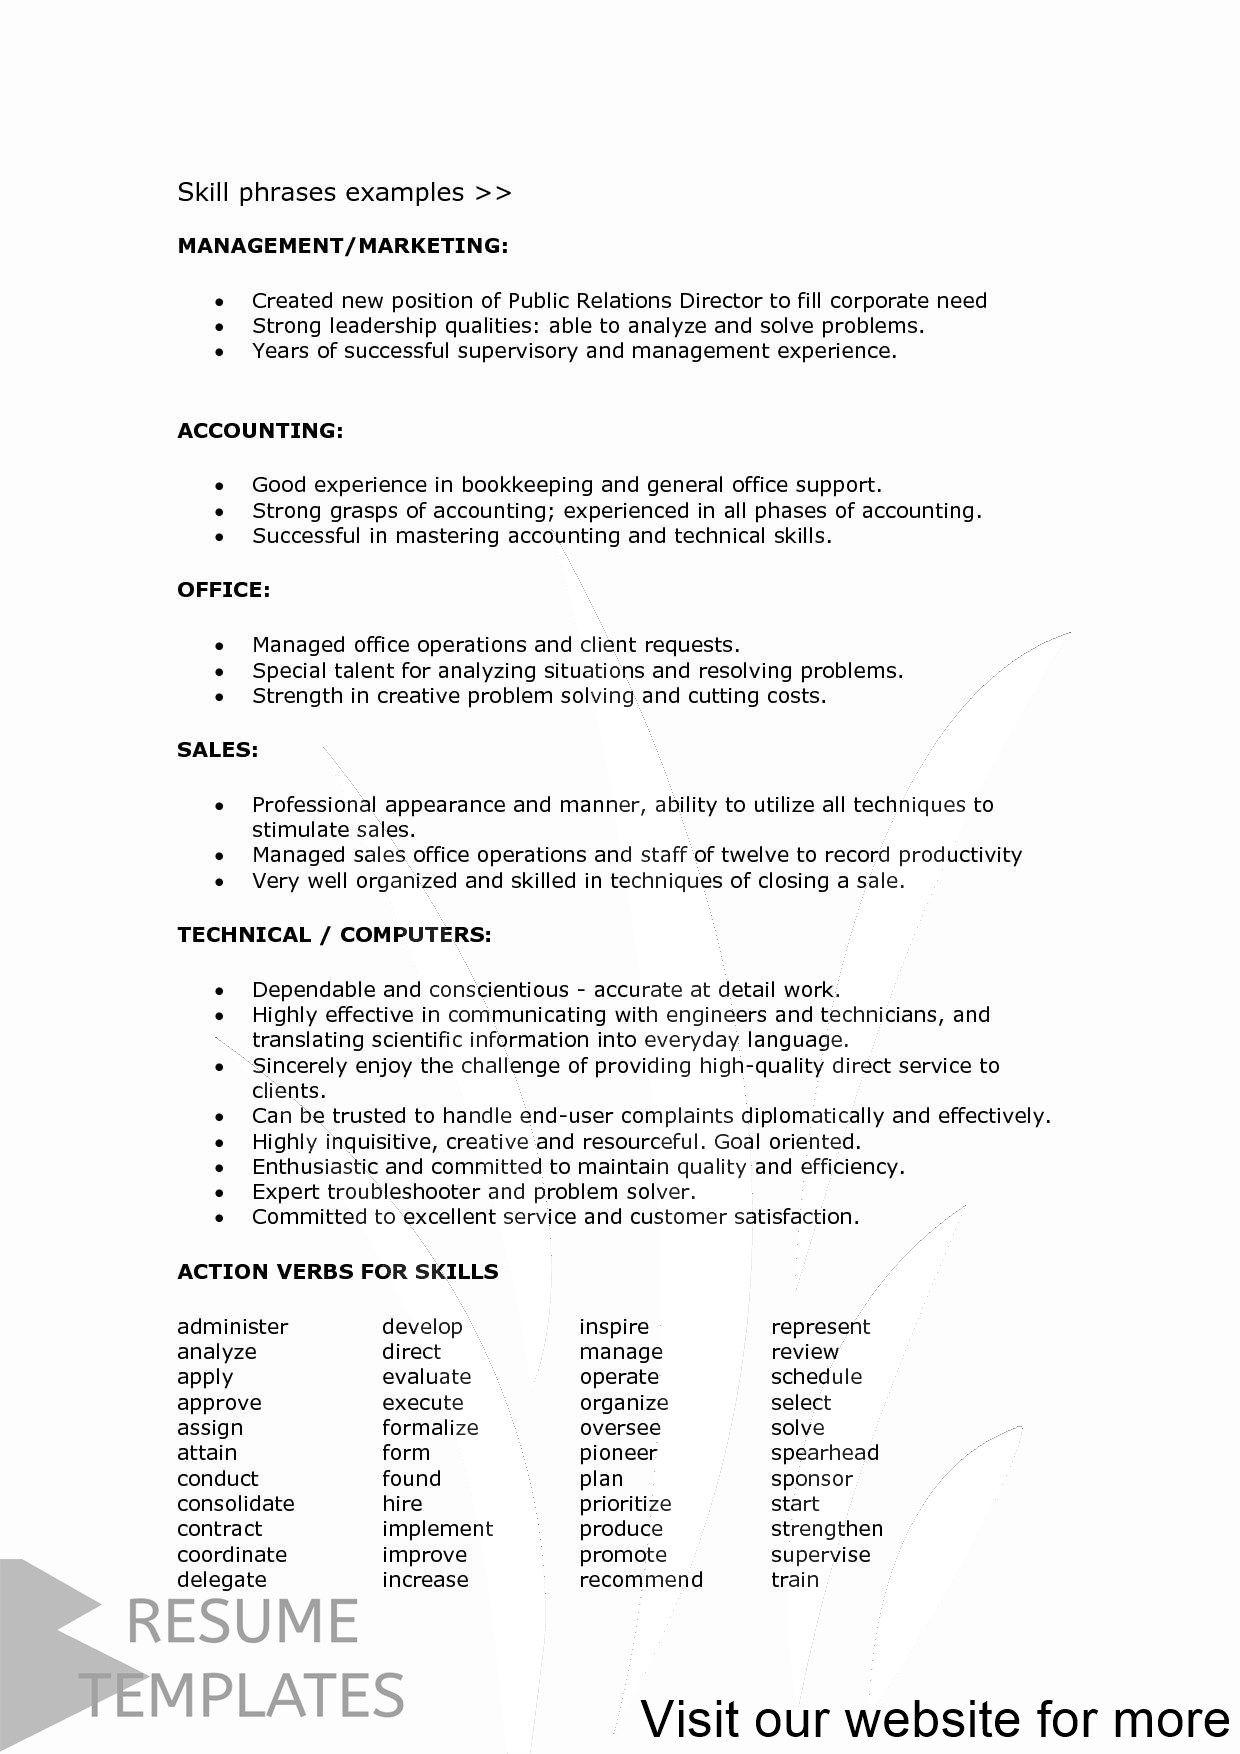 Resume Template Resume Design Resume Tips Resume Examples